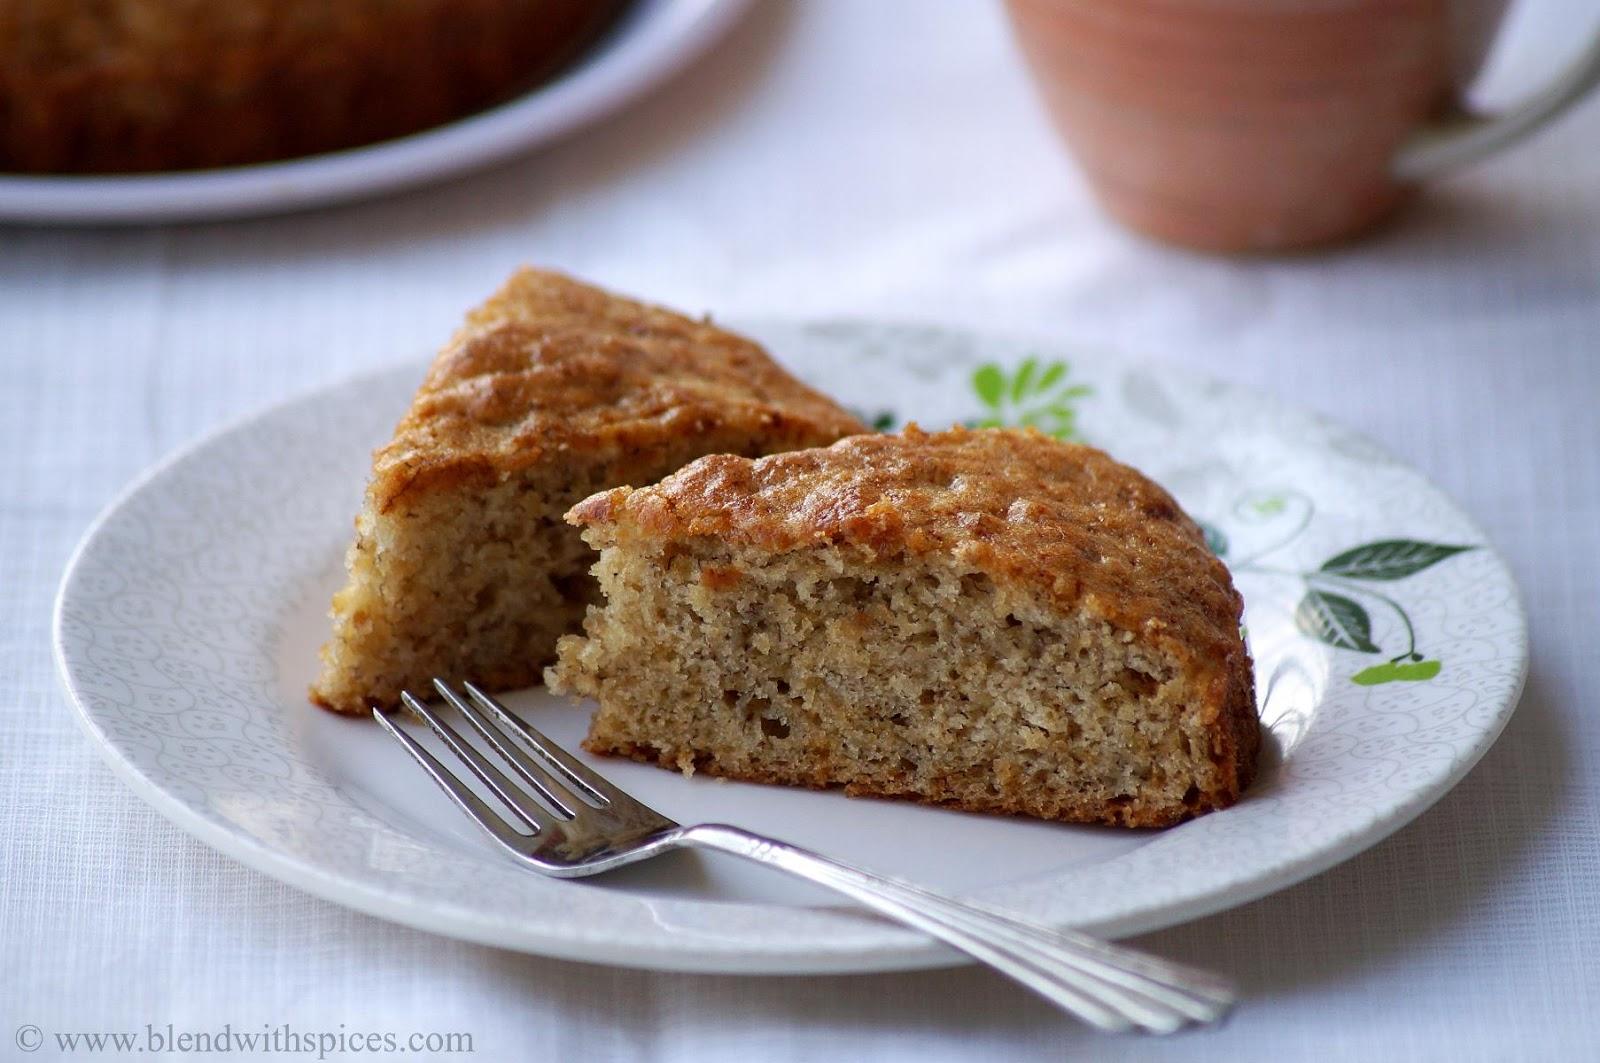 Banana cake recipe vegetarian